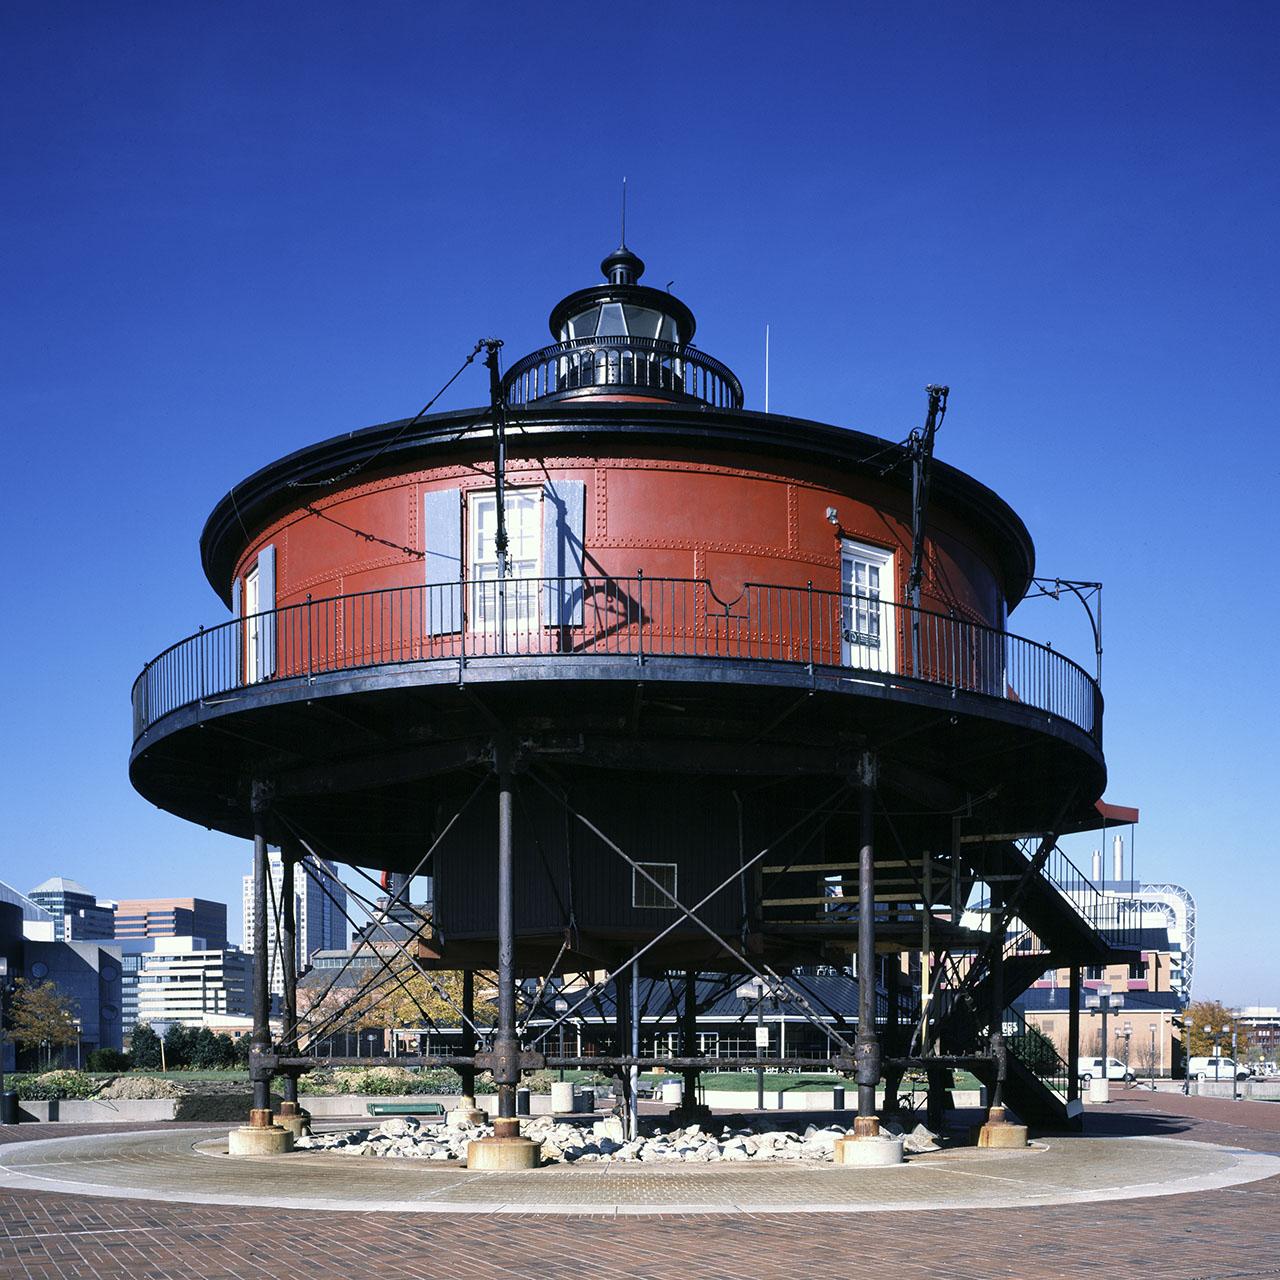 Seven Foot Knoll Light, Baltimore, Maryland